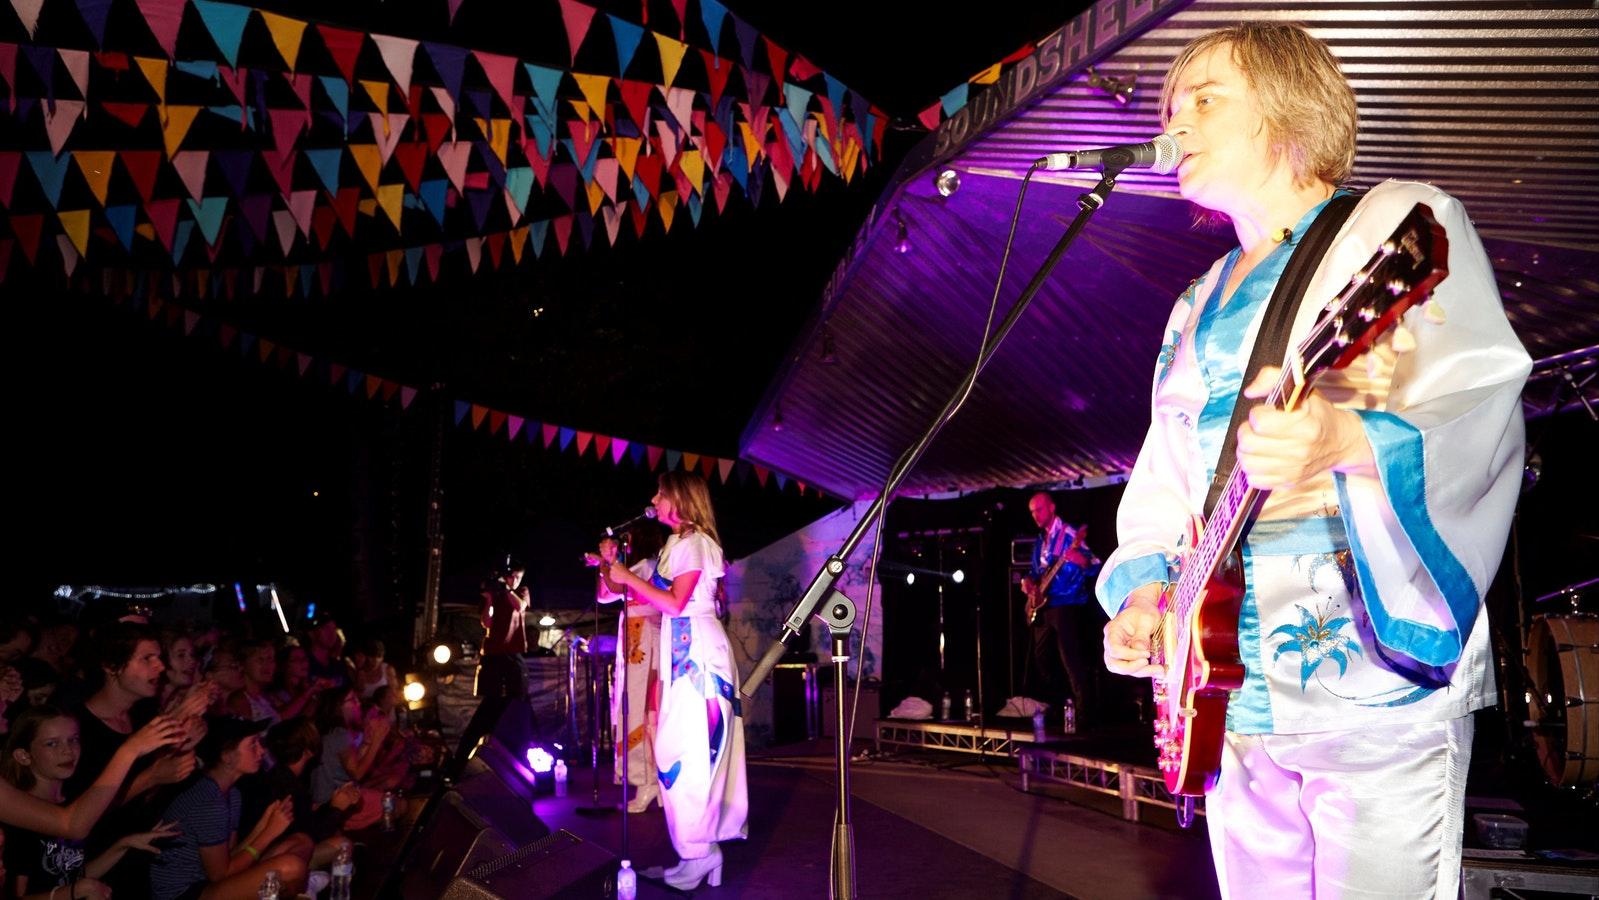 Brighter Days Festival - free entertainment